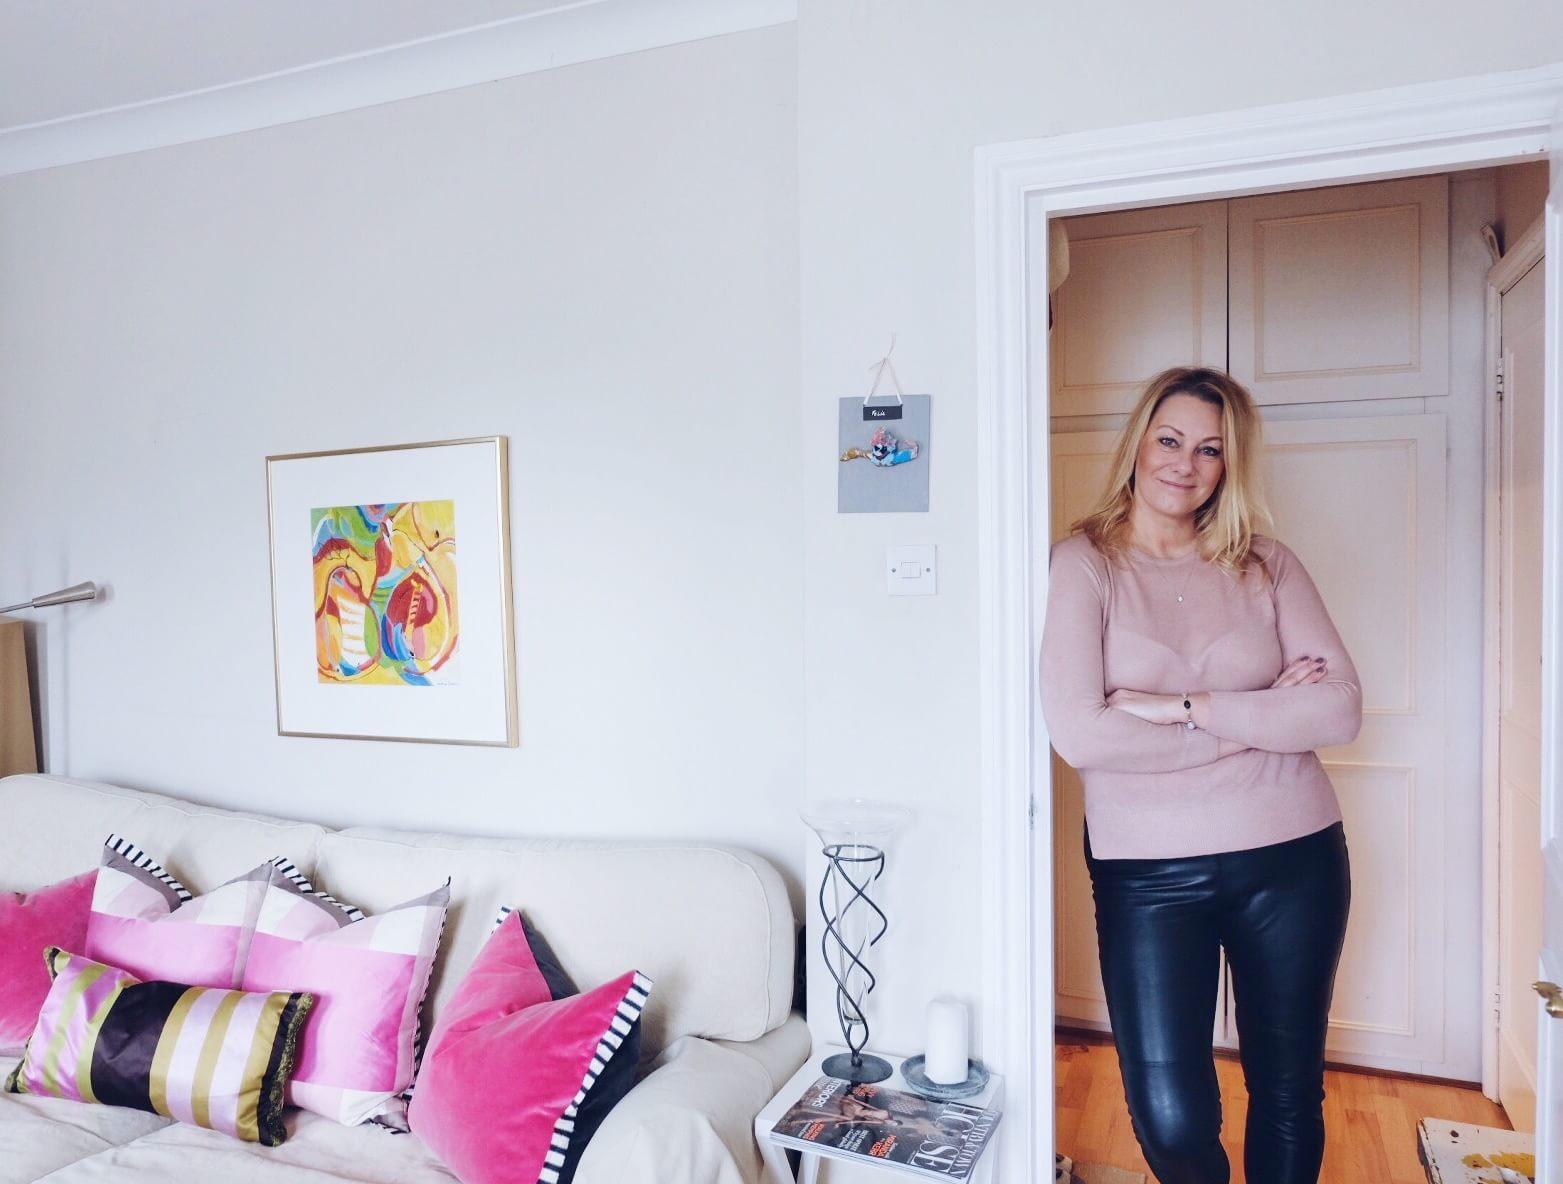 Hemma Hos Inredningsdesignern Annelie